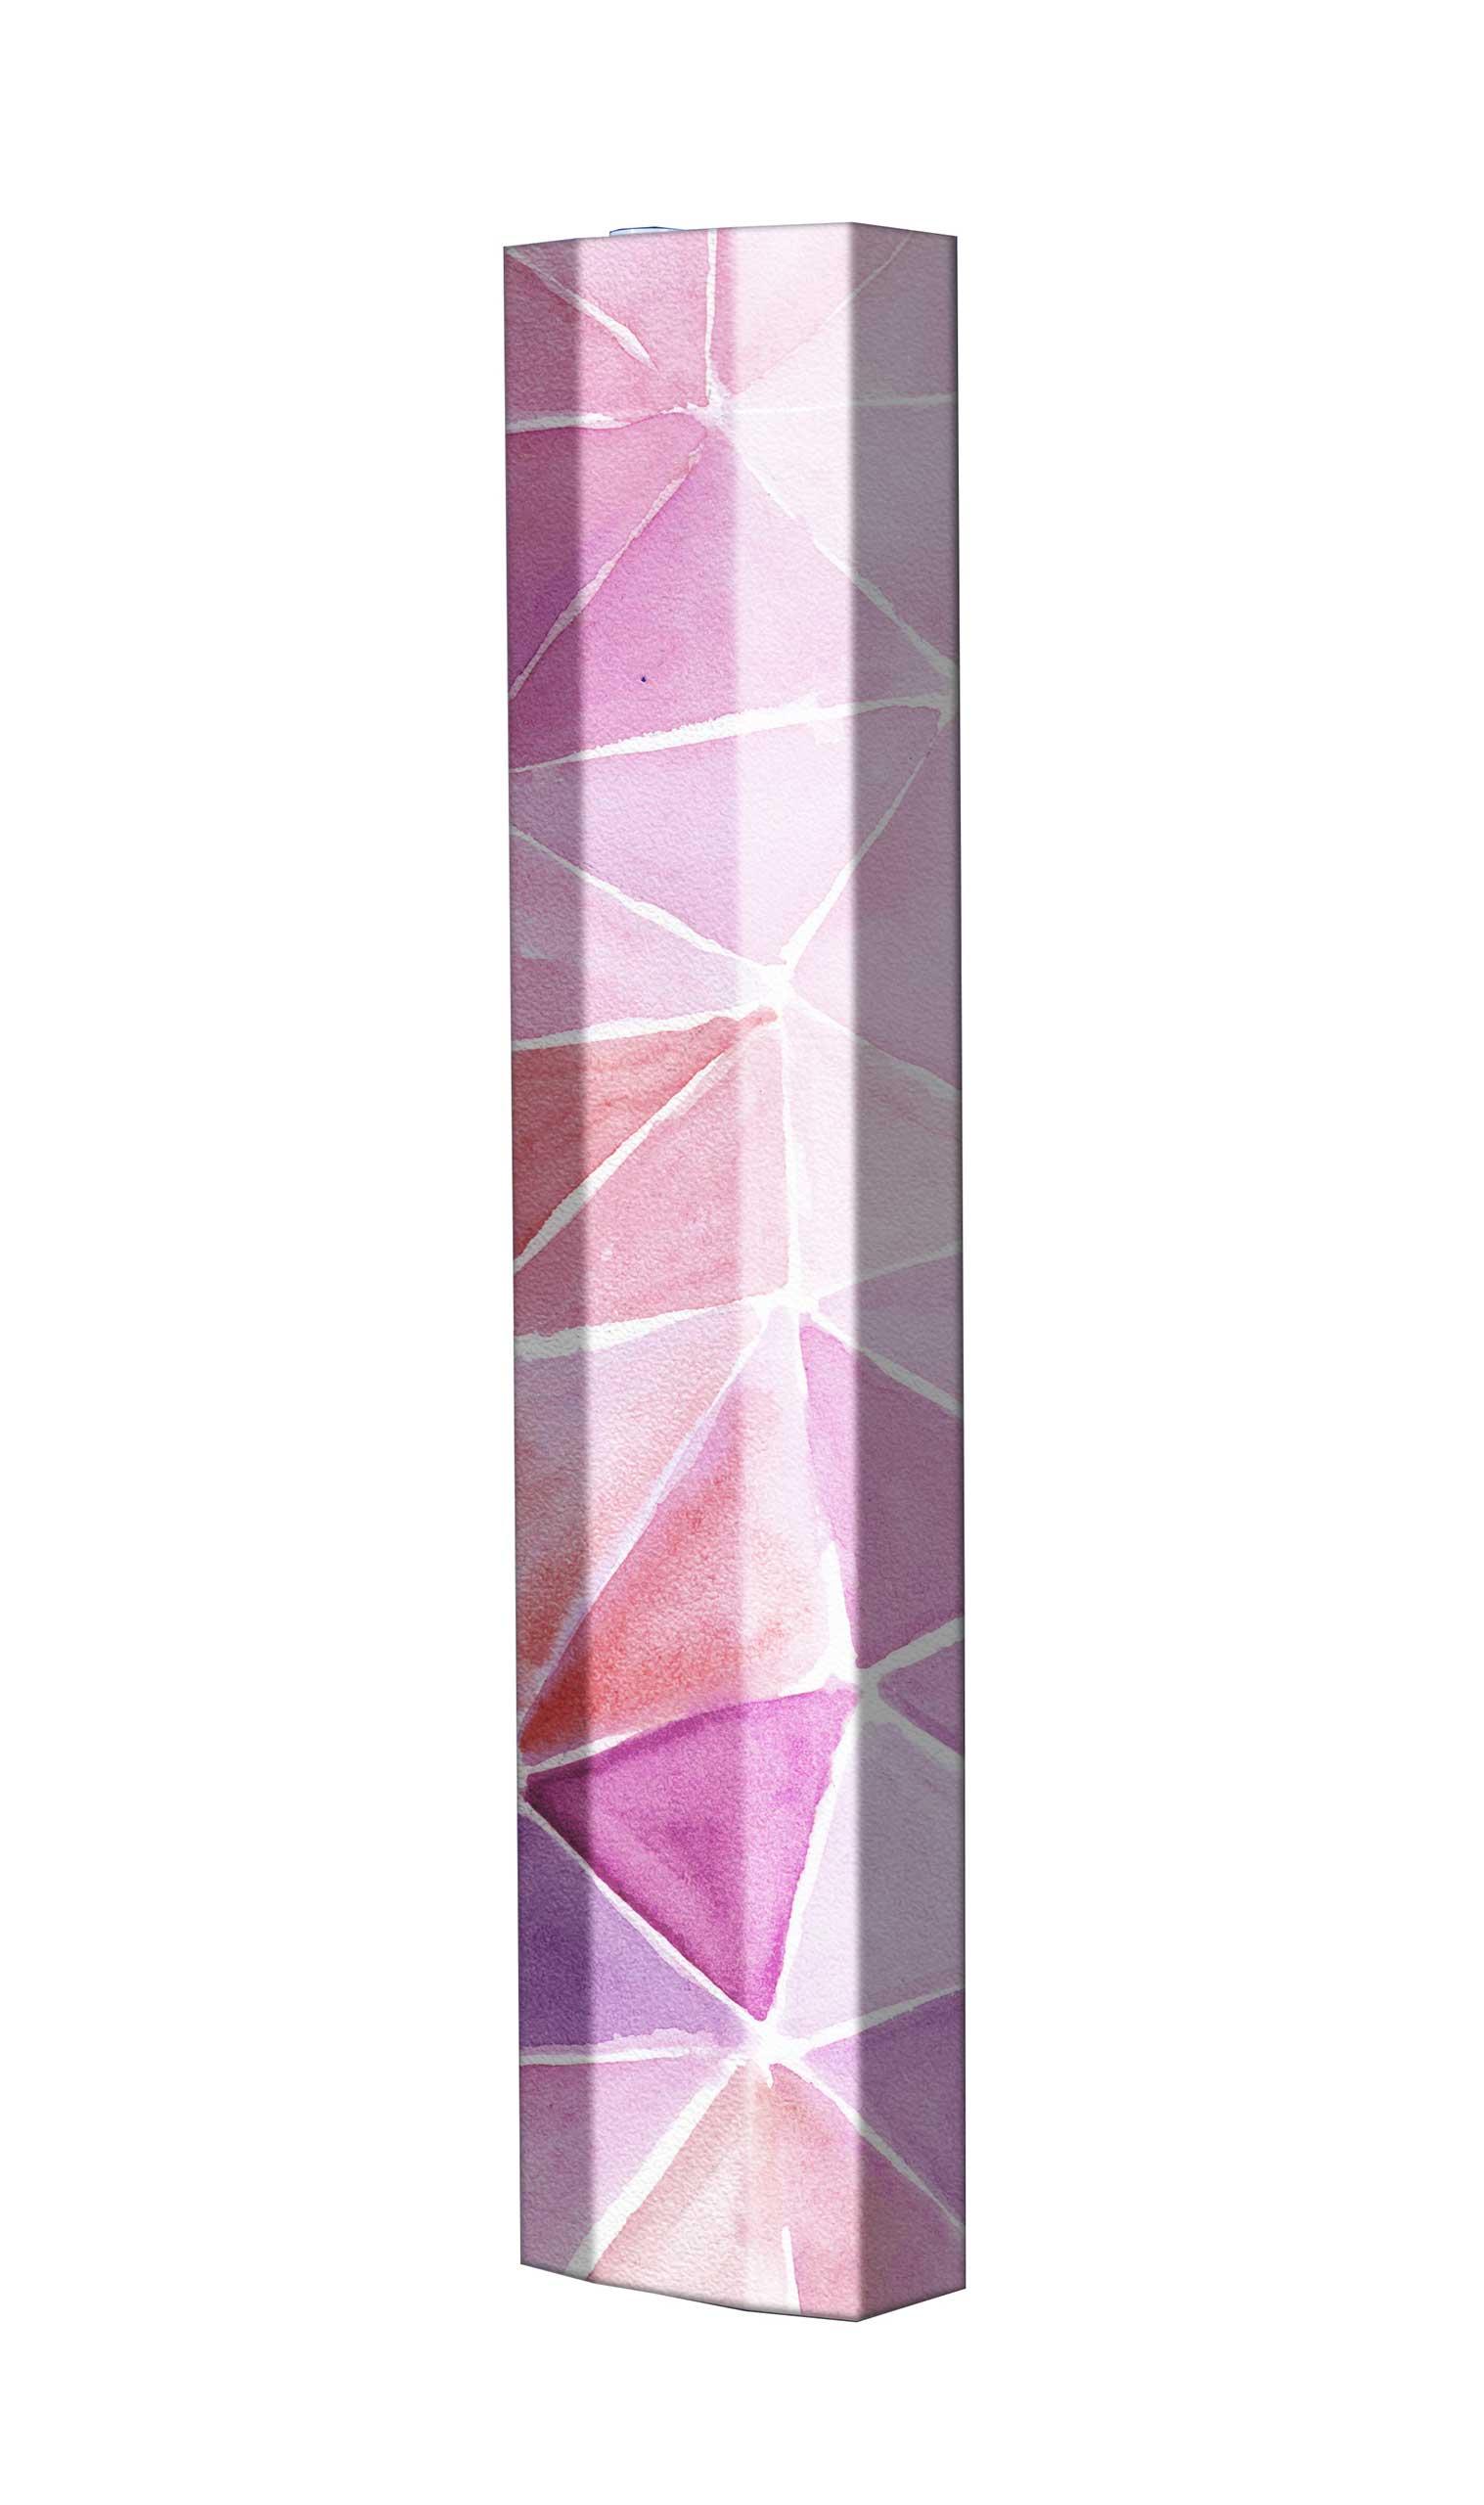 Schuhschrank STORM Motivschrank Single S108 Rosa Muster weiß